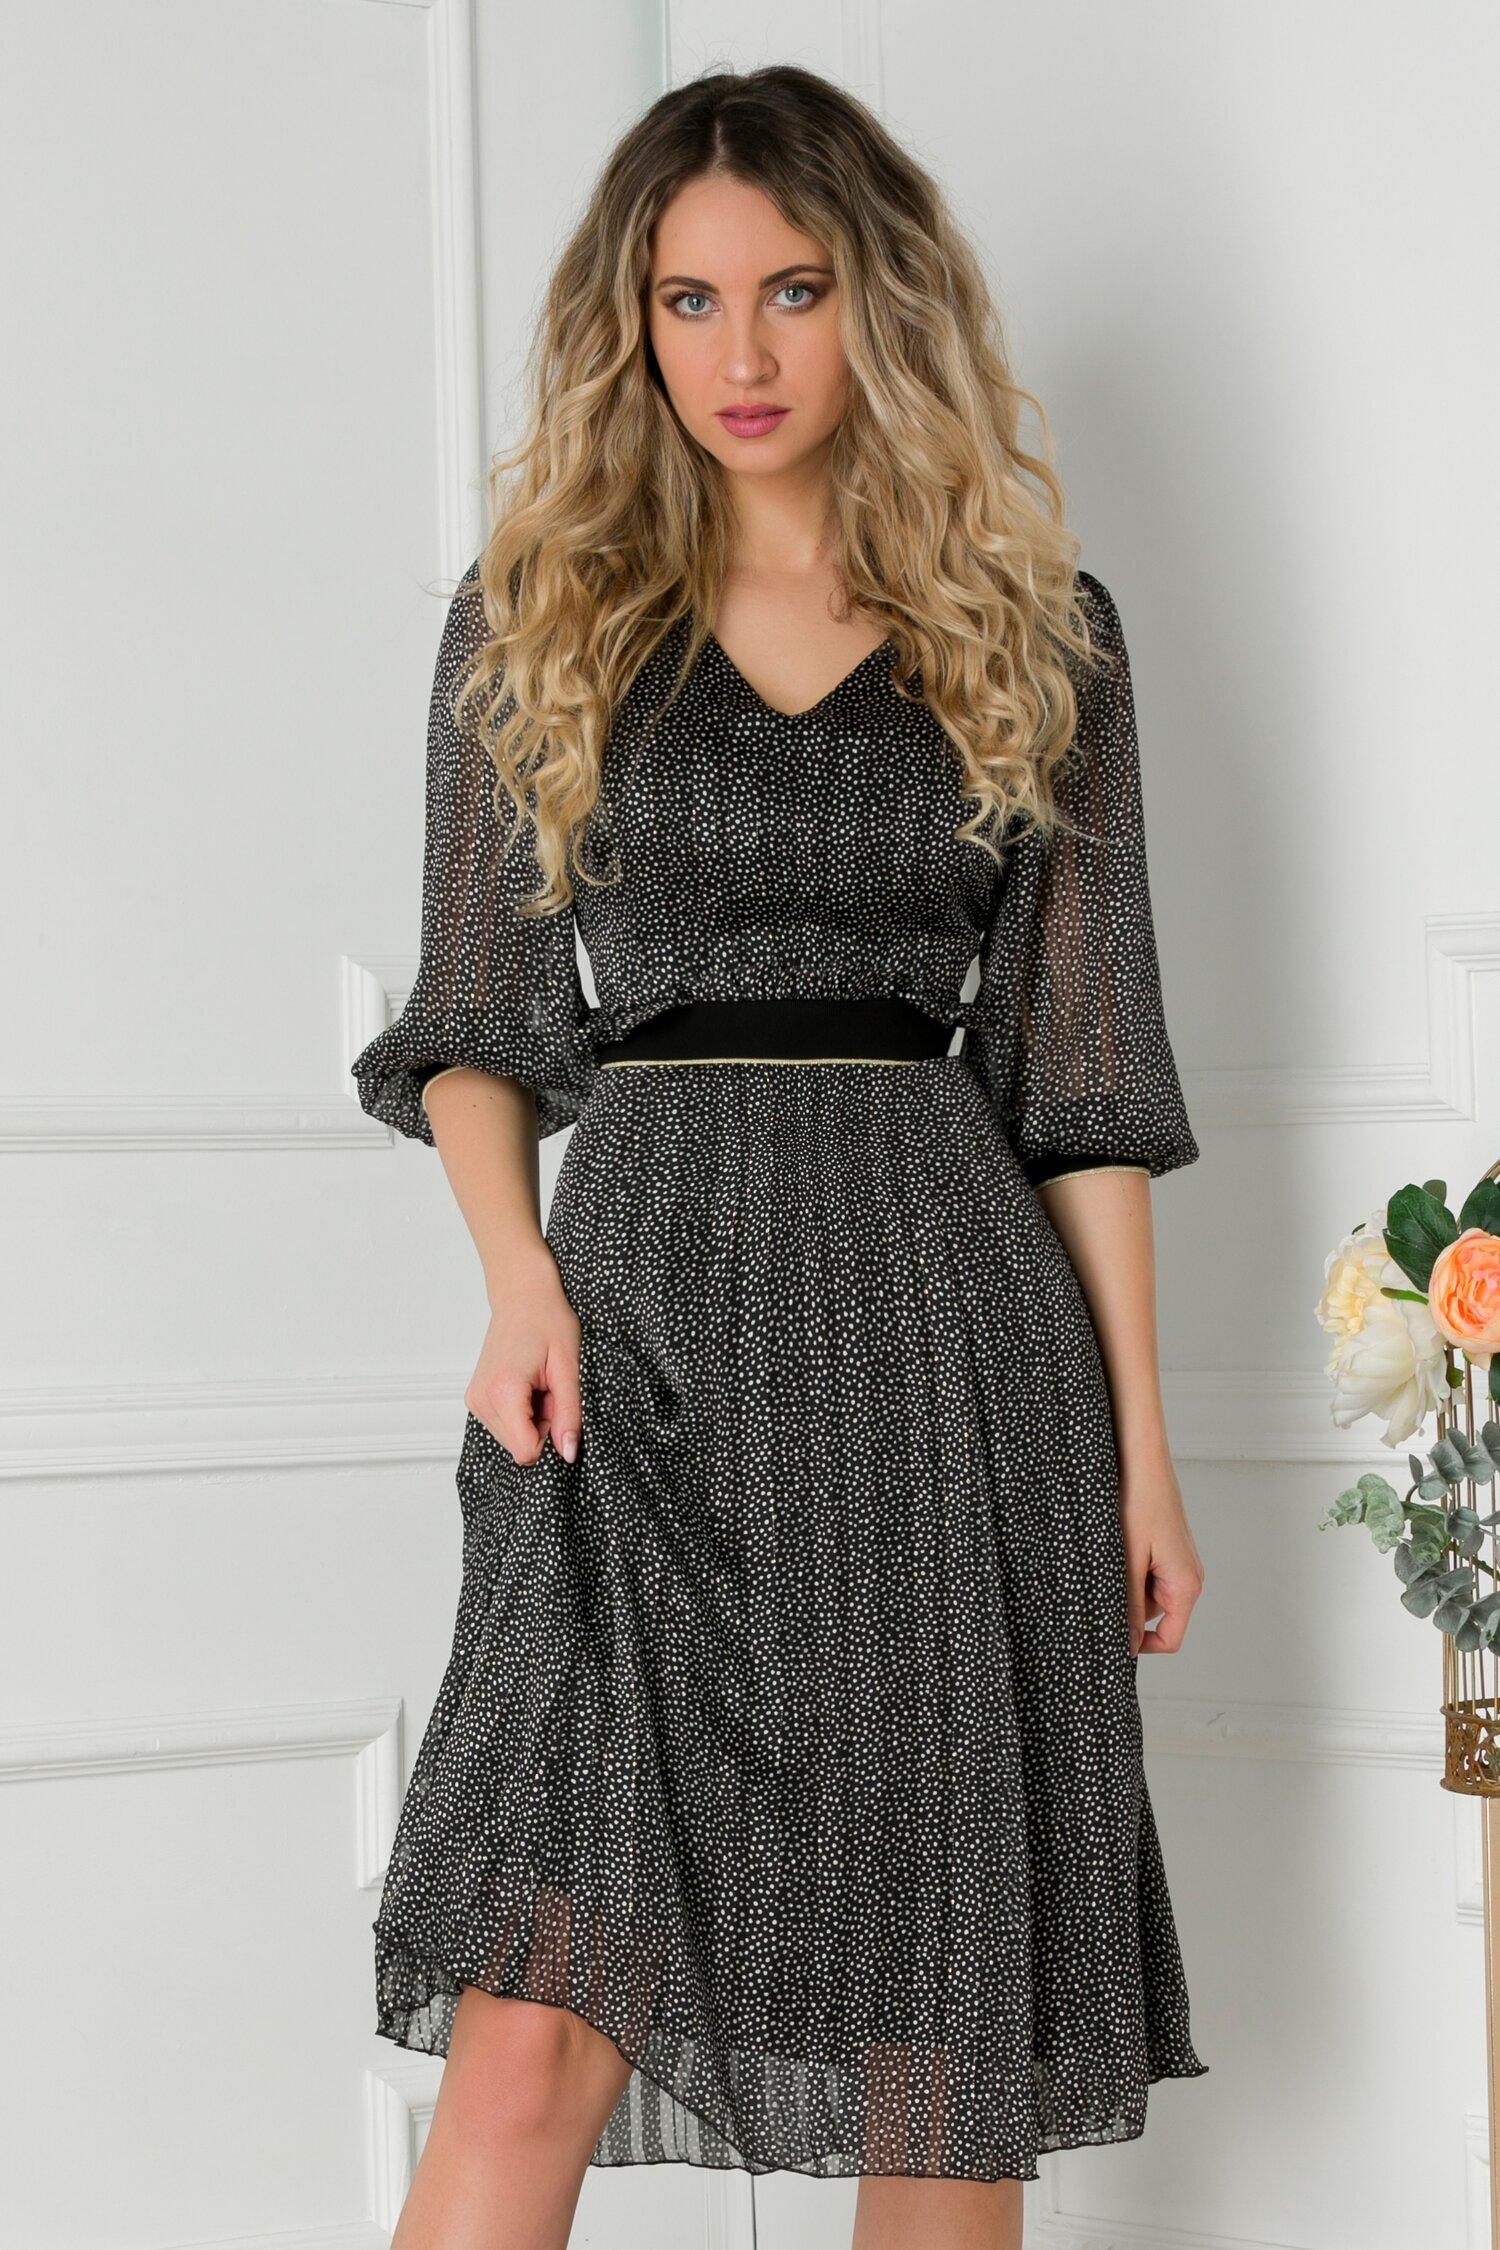 Rochie Leonard Collection neagra cu buline si elastic in talie